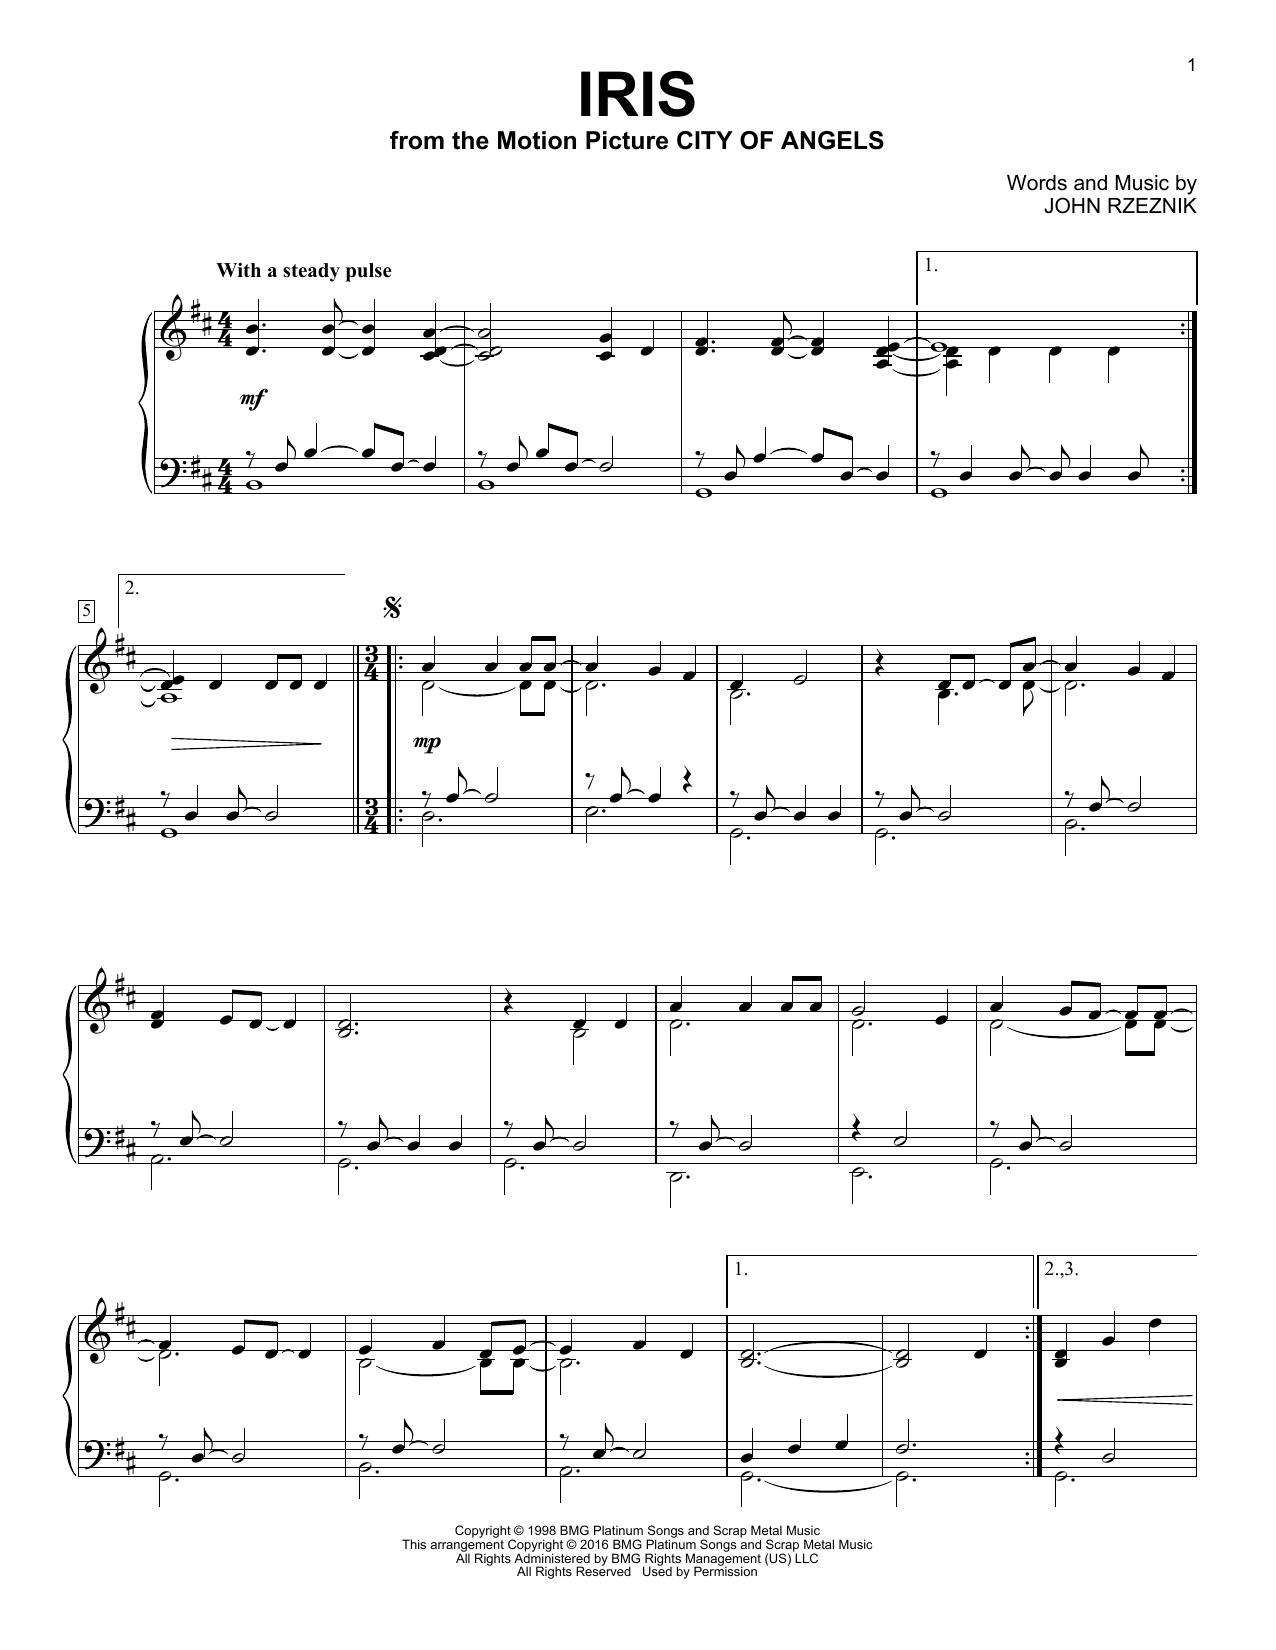 Sheet Music Digital Files To Print Licensed Goo Goo Dolls Digital